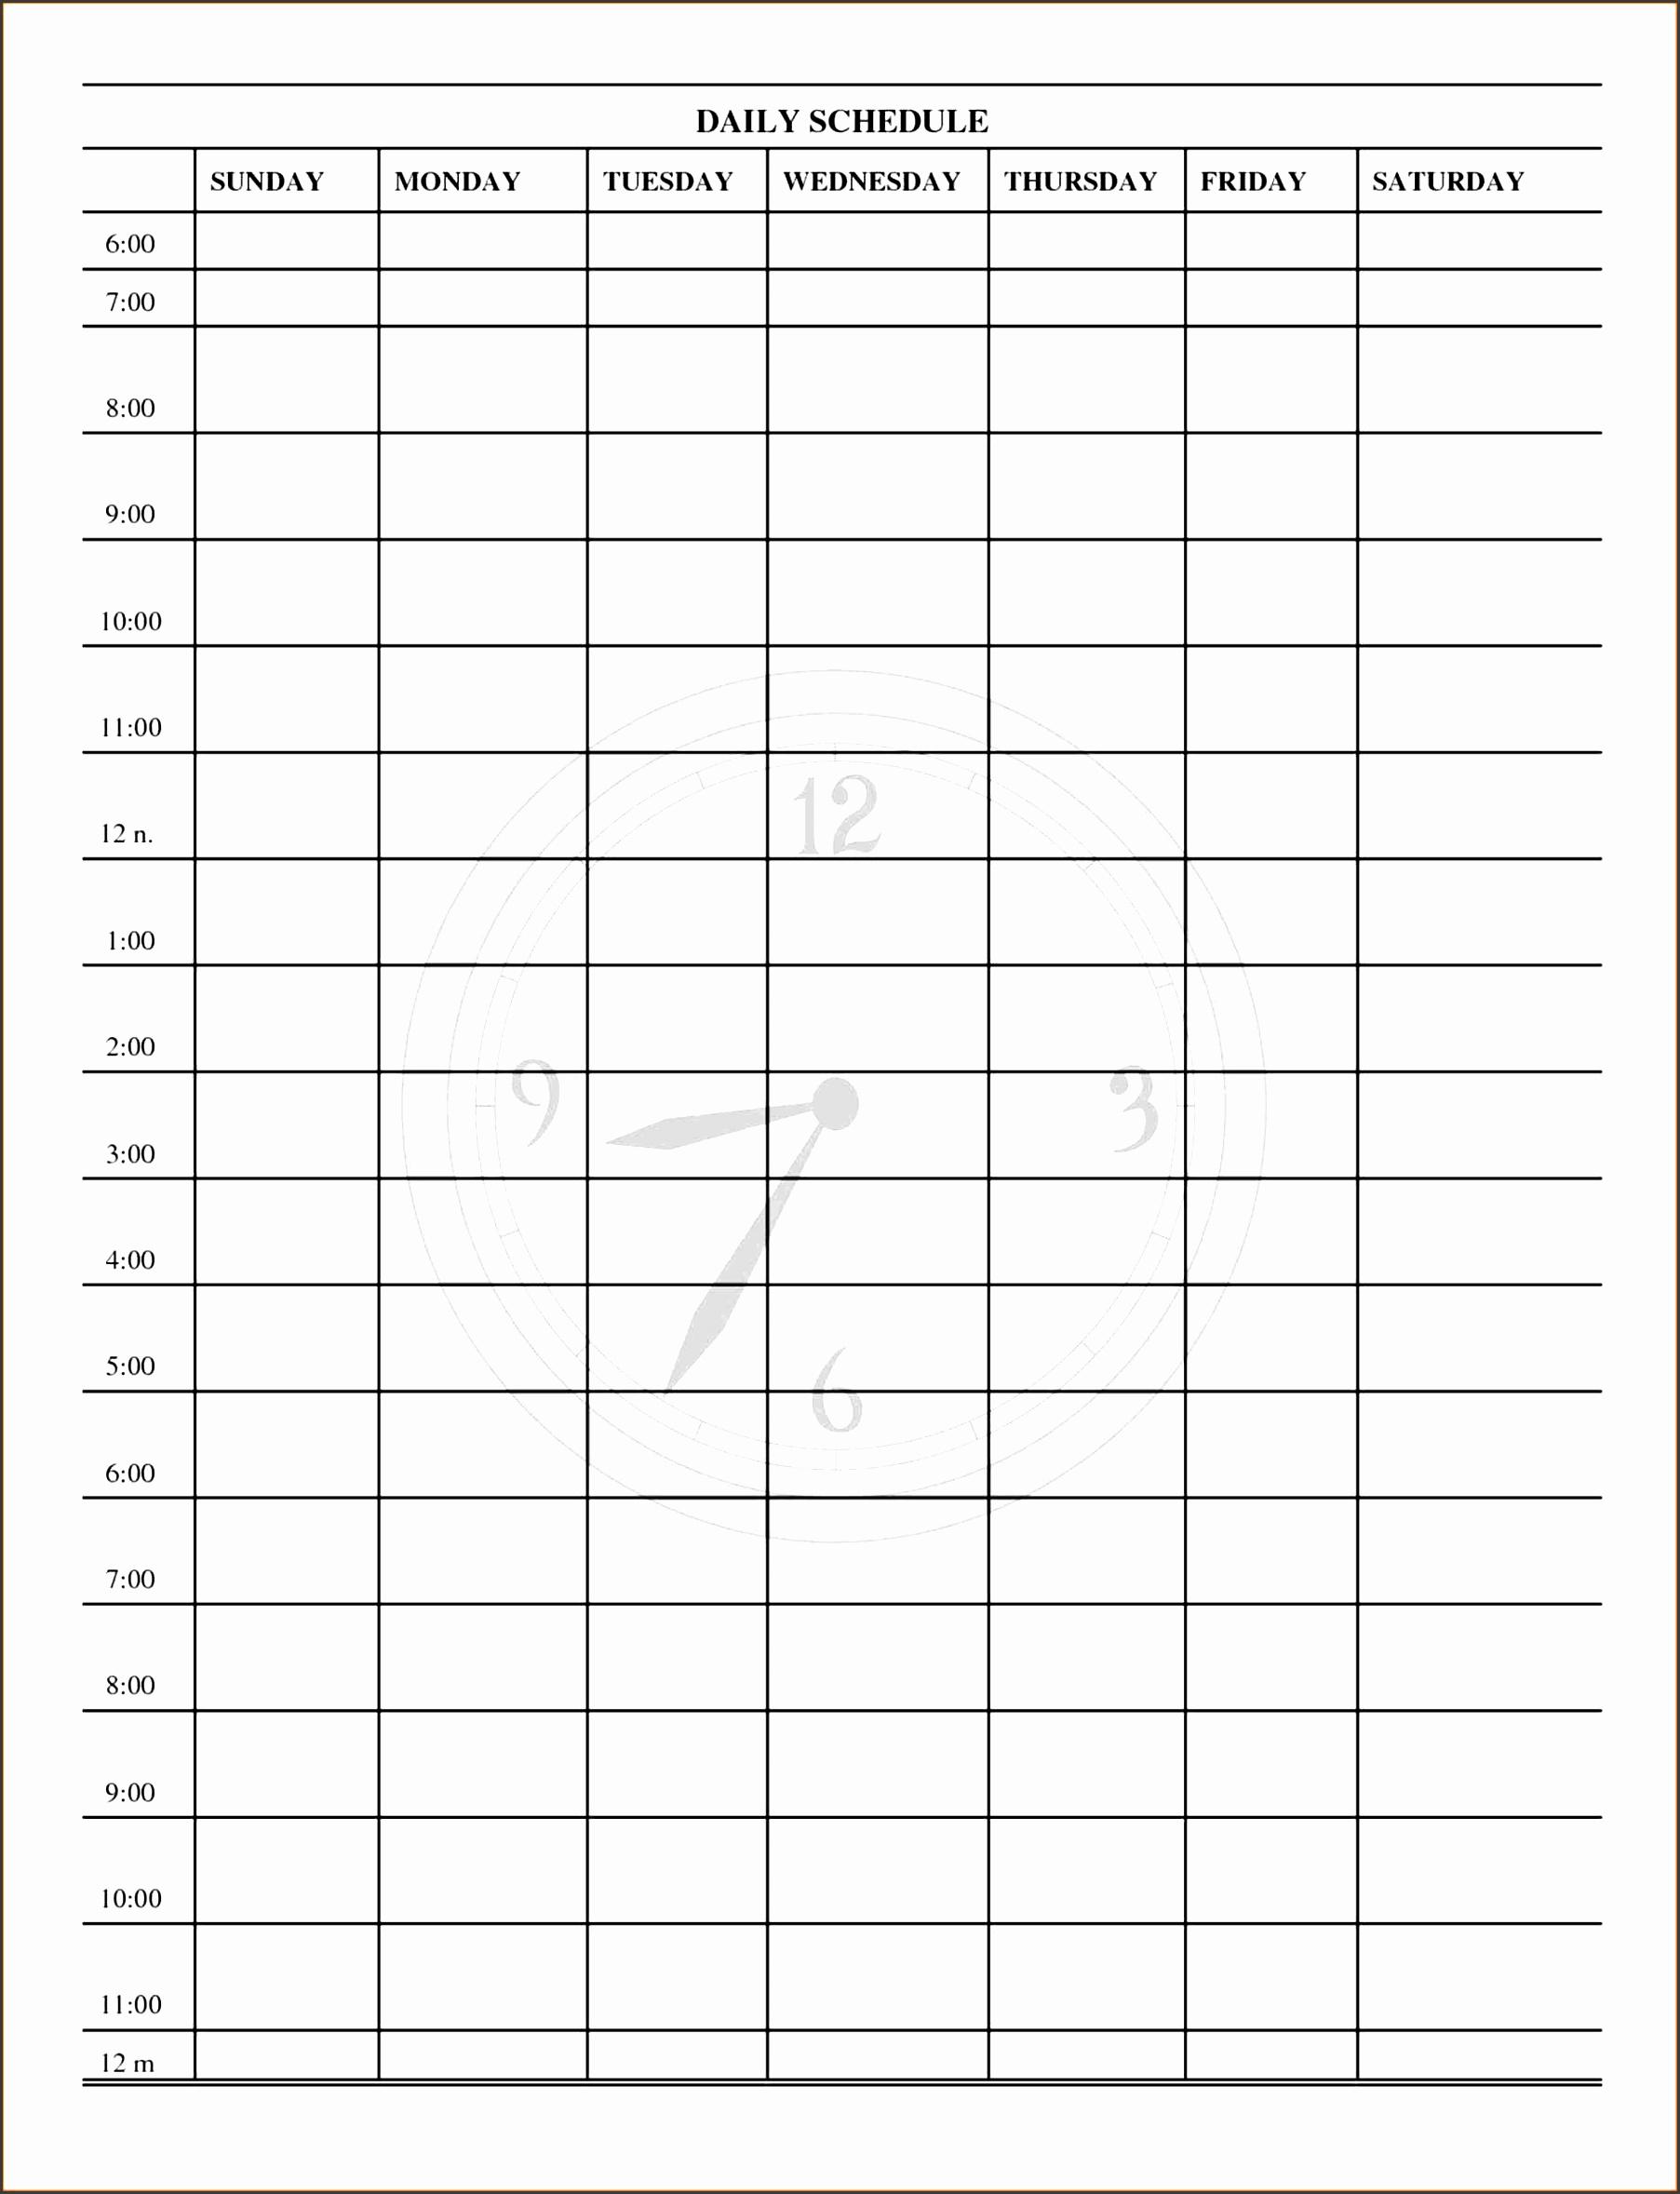 template excel weekly employee schedule template sendlettersinfo daily work log receipt templates daily daily work schedule